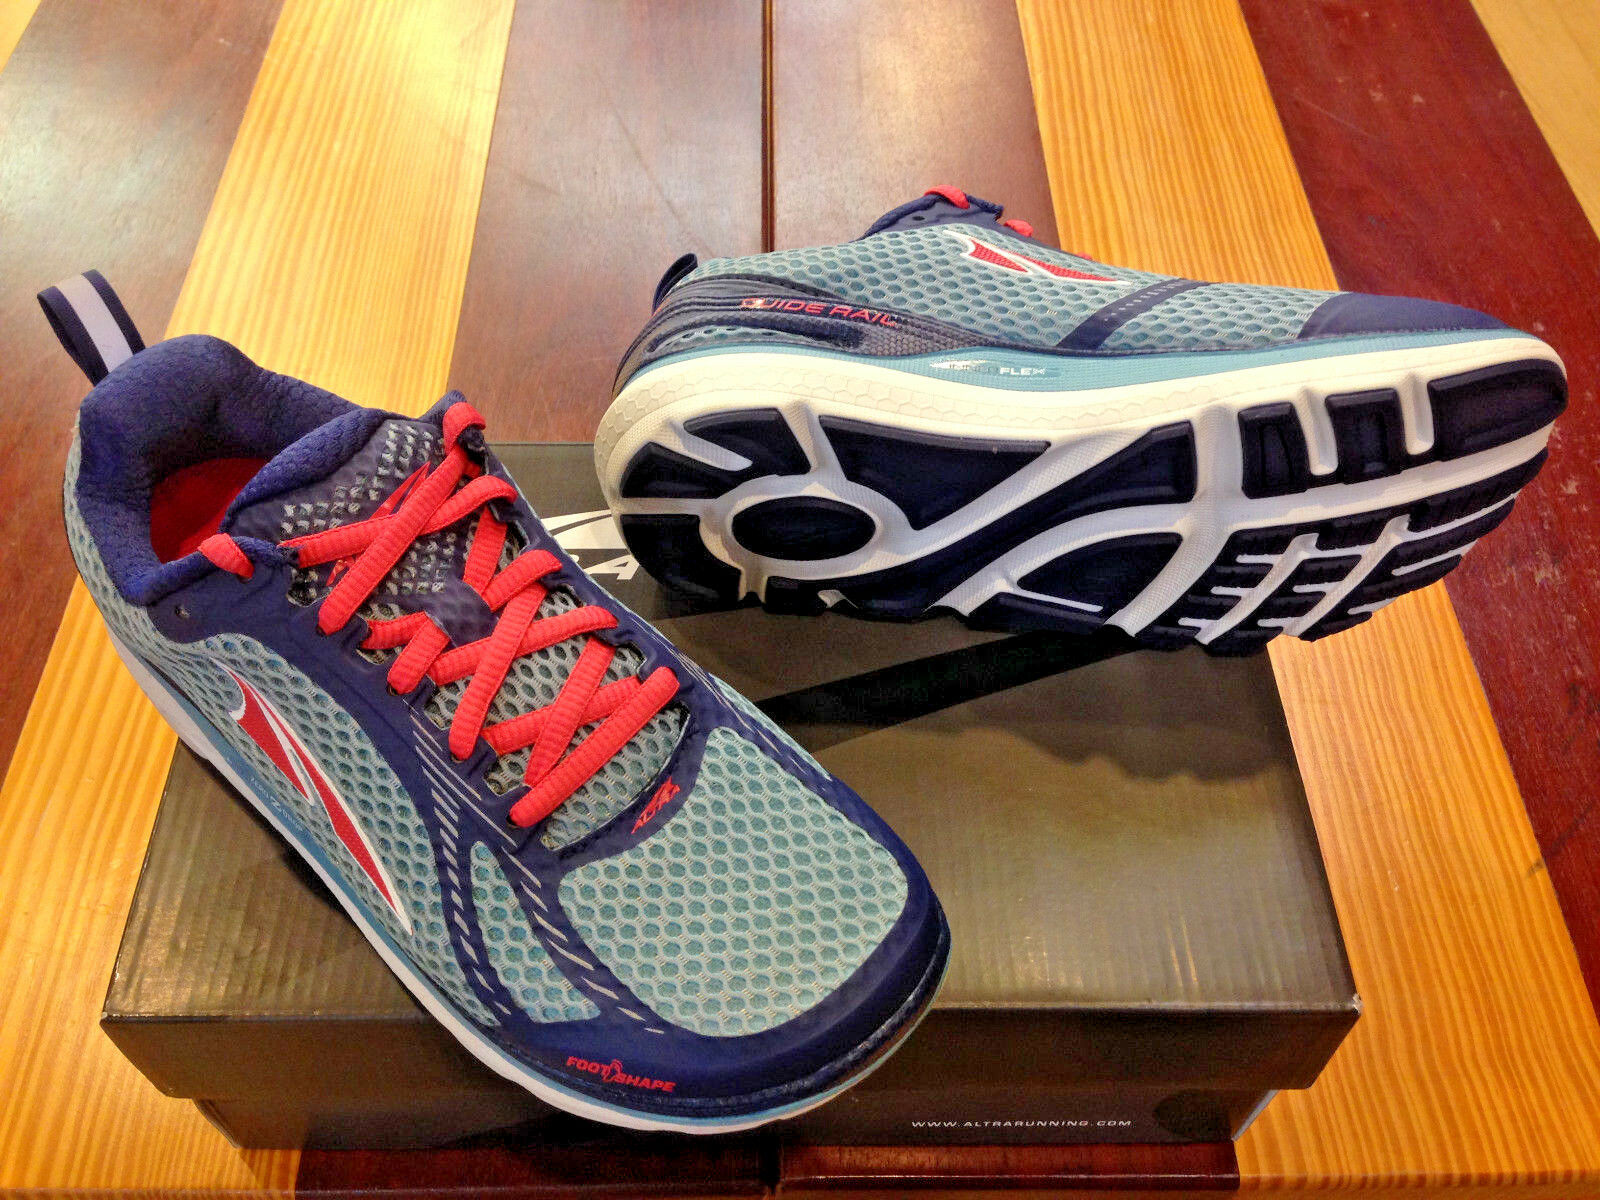 Altra Paradigm 3.0  - Dark blueee - Women's Running shoes  up to 70% off